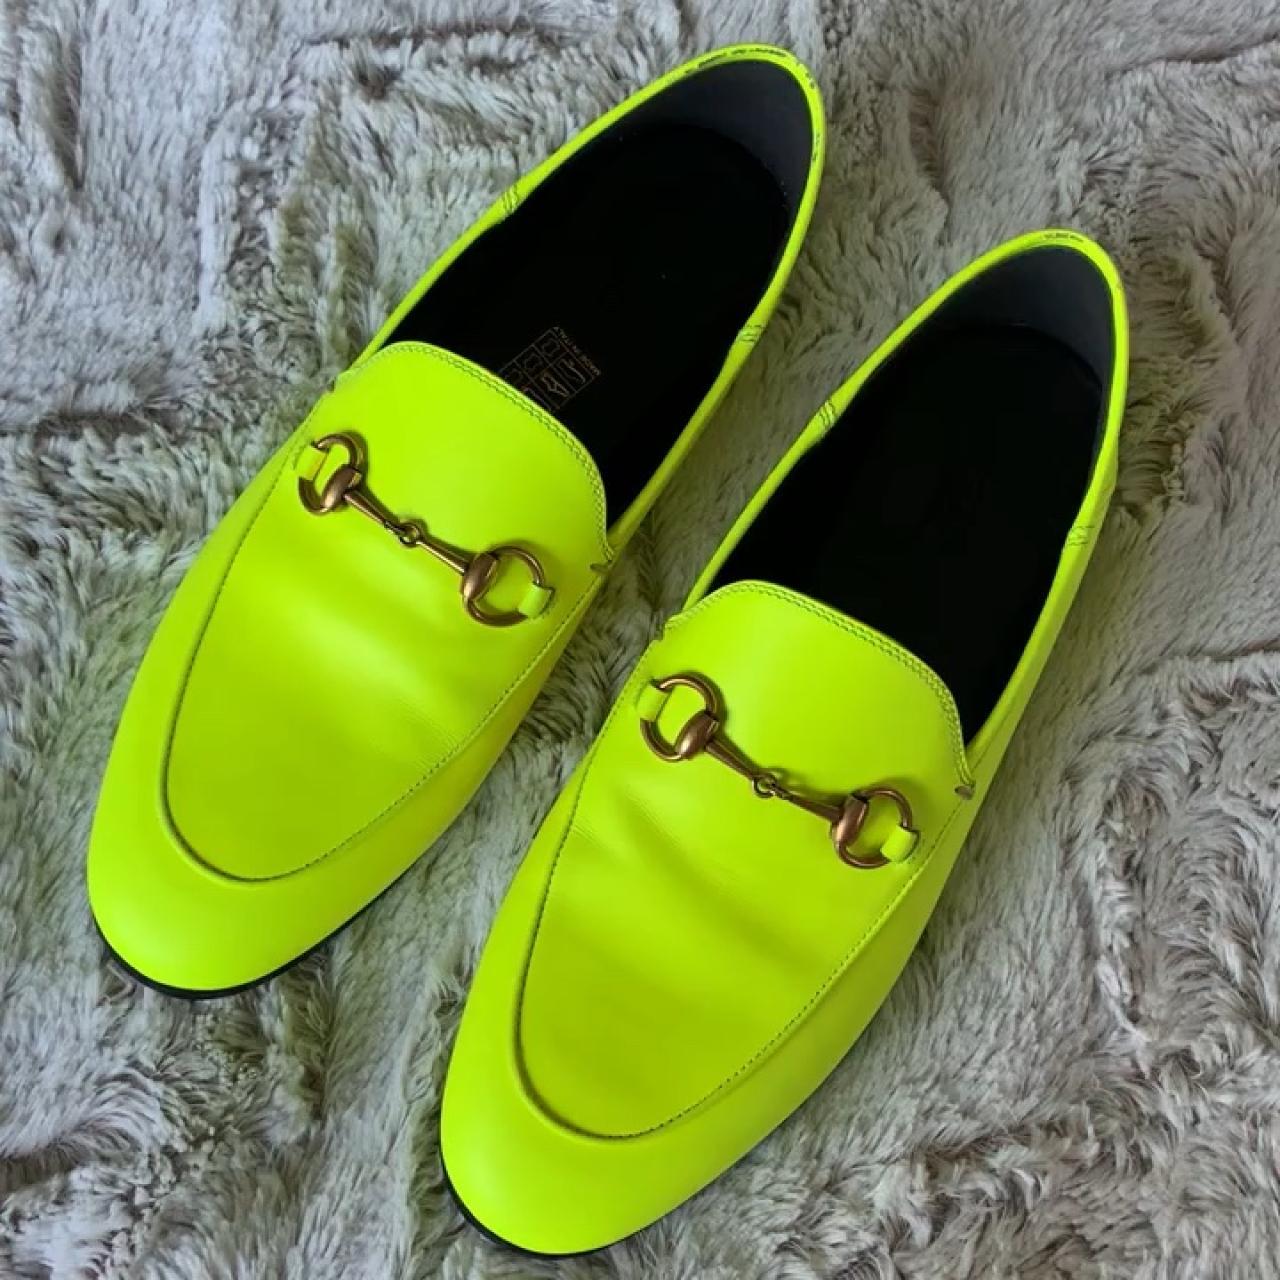 7ddd90b56 Gucci Brixton Neon Leather Horsebit Loafers. Never worn. on - Depop